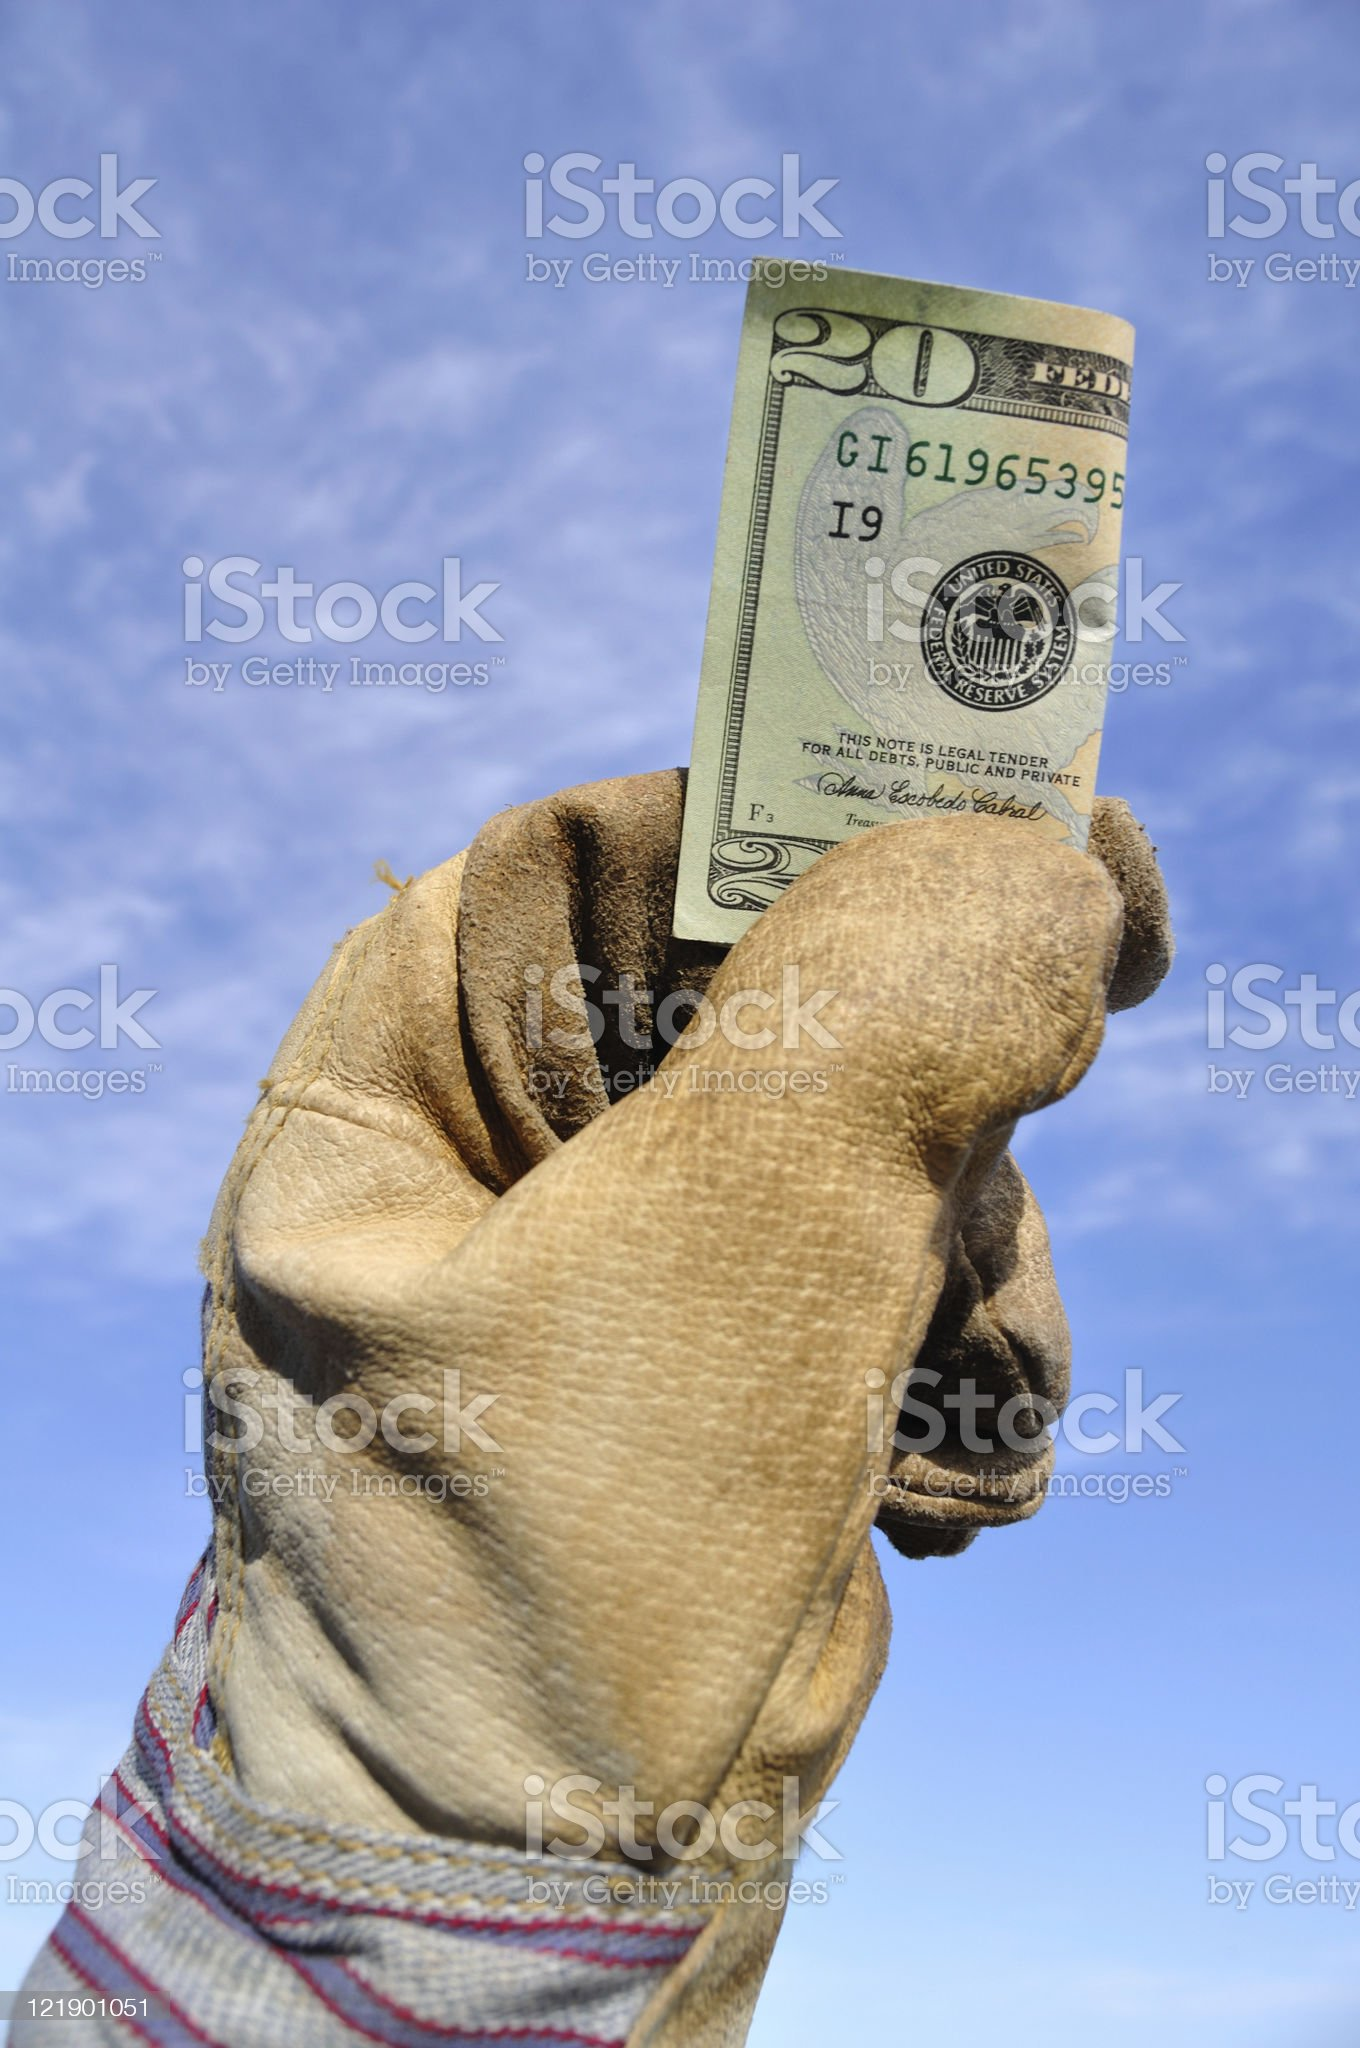 Worker Holding a Twenty Dollar Bill royalty-free stock photo